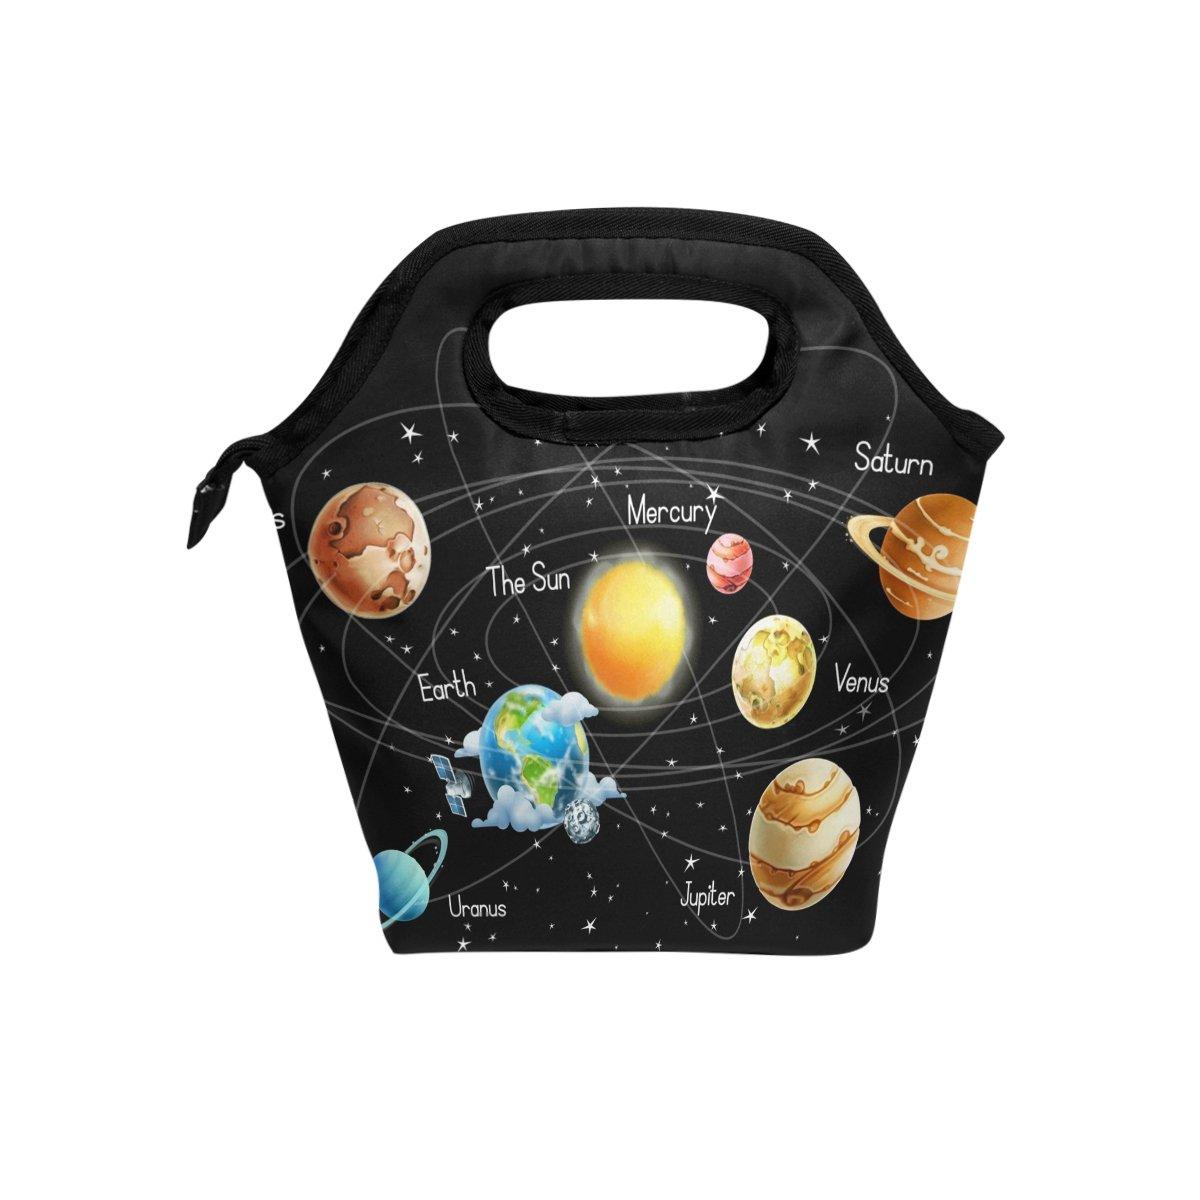 JOYPRINT Lunch Box Bag, Universe Galaxy Solar System Insulated Cooler Ice Lunchbox Tote Bag Handbag for Men Women Kids Adult Boys Girls